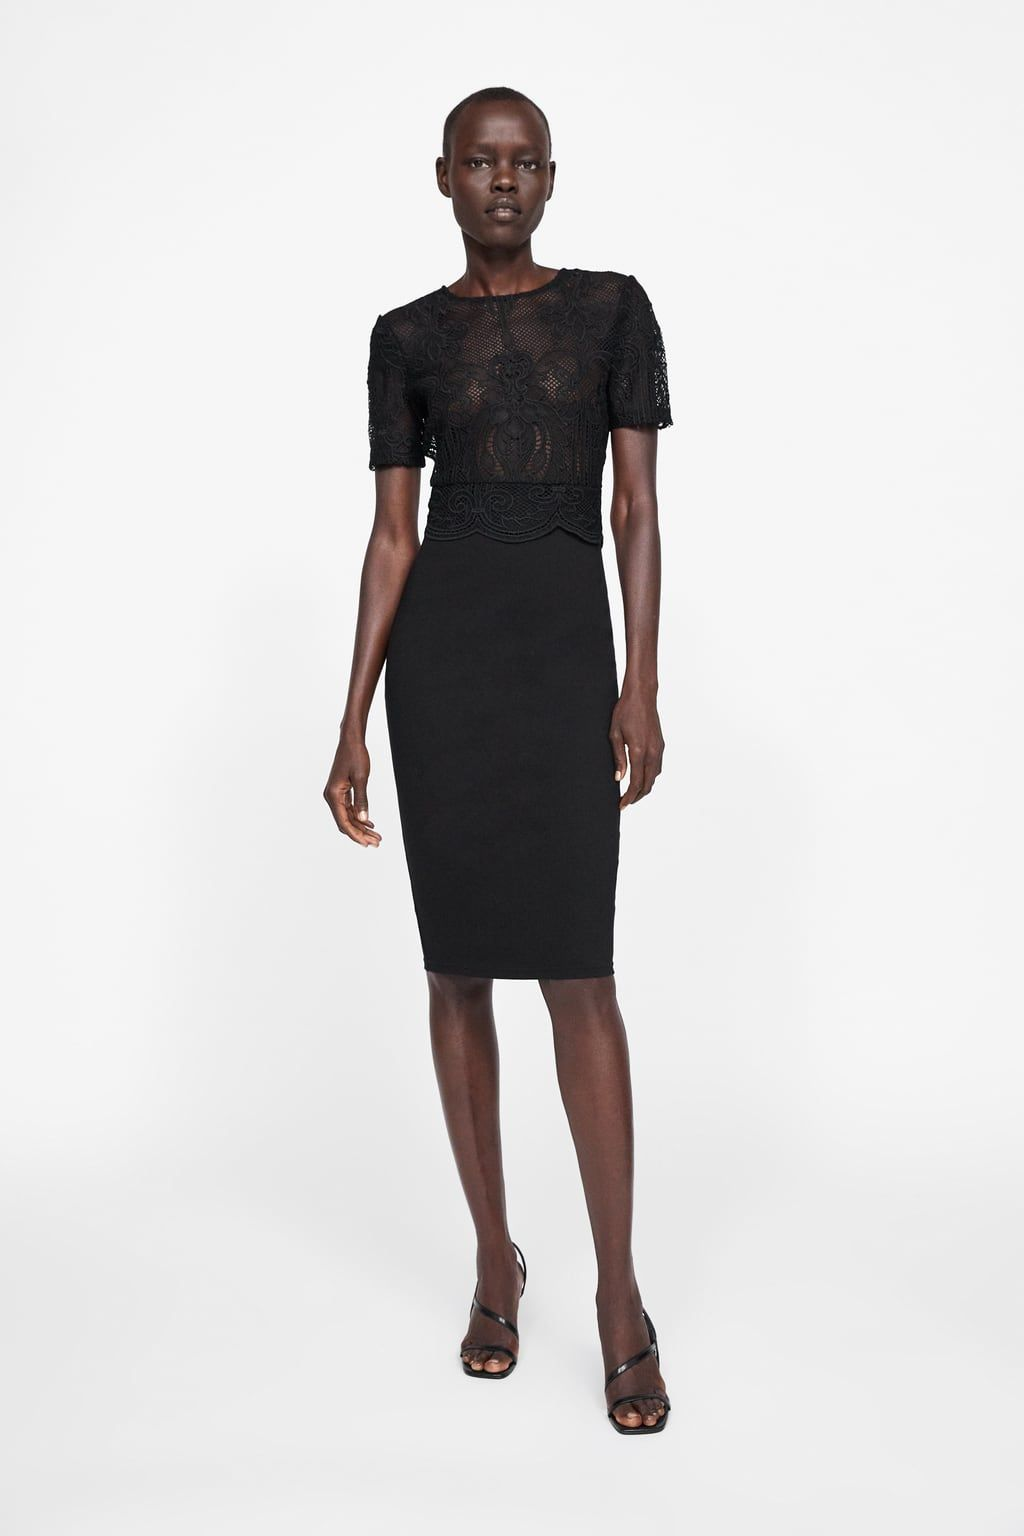 Contrasting lace dress | Zara black dress, Lace dress ...